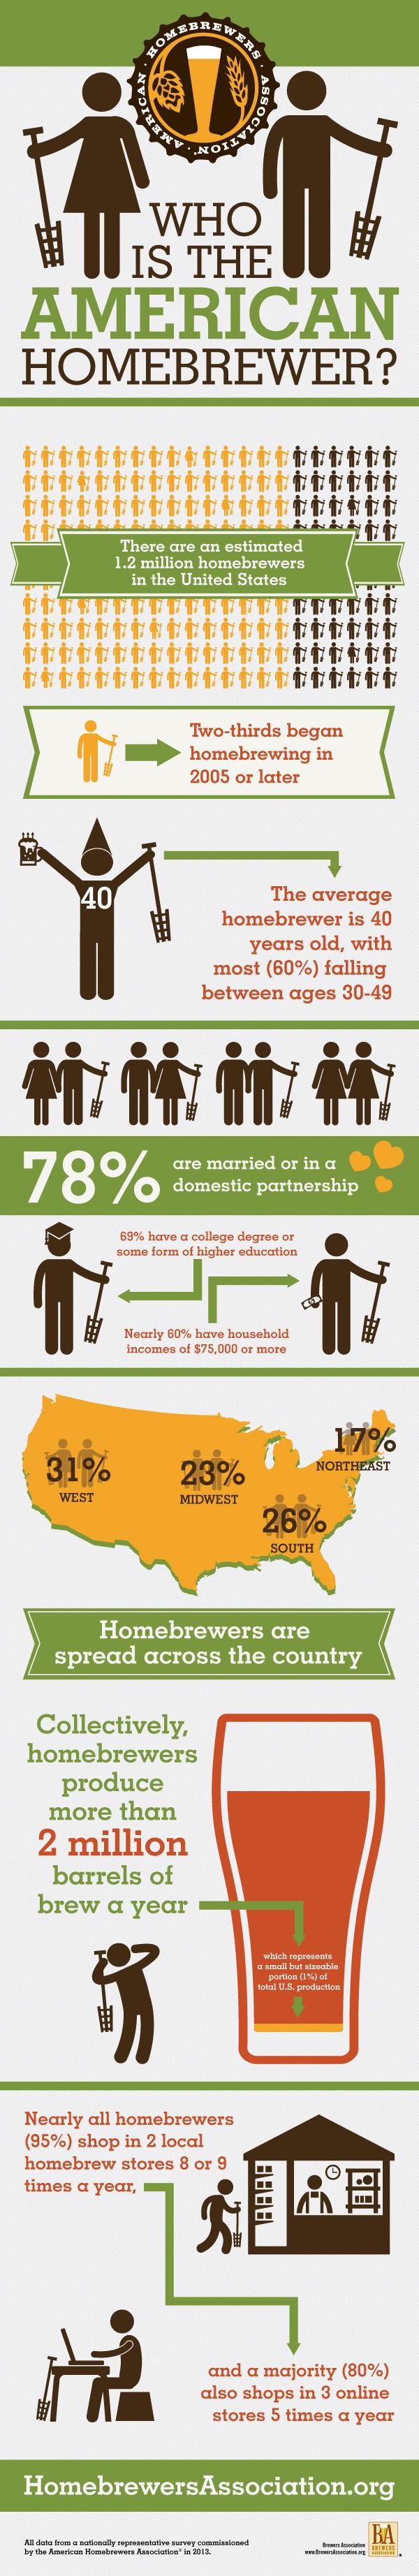 2013 Homebrewer Demographics Infographic